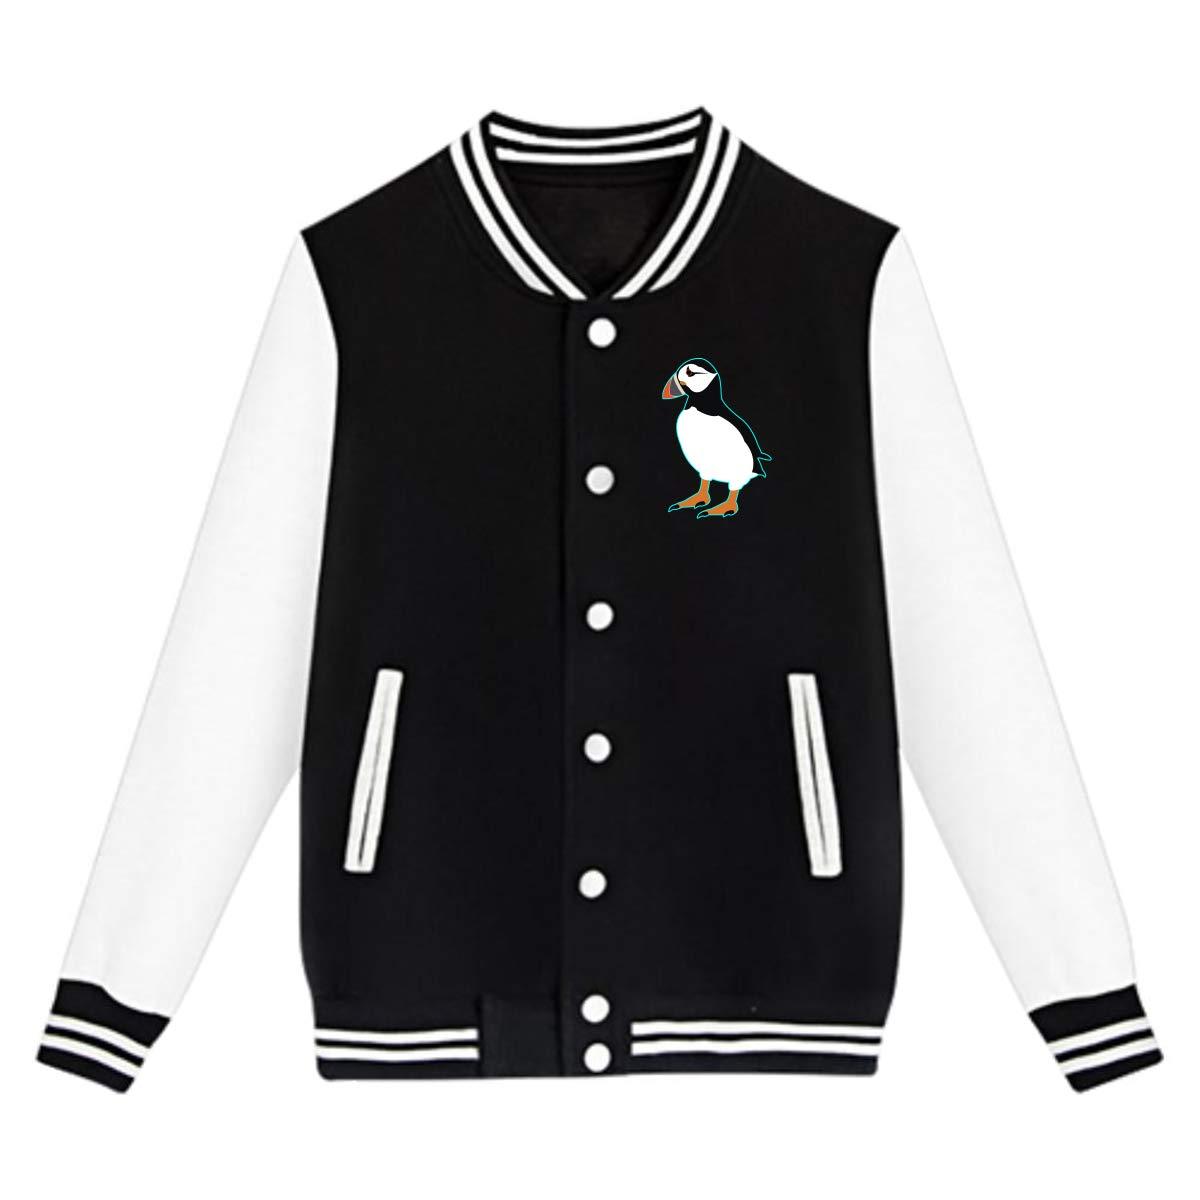 Tina TN Puffin Bird Teens Boys Girl Varsity Baseball Jacket Long Sleeve Sport Baseball Uniform Jacket Coat Sweater Black